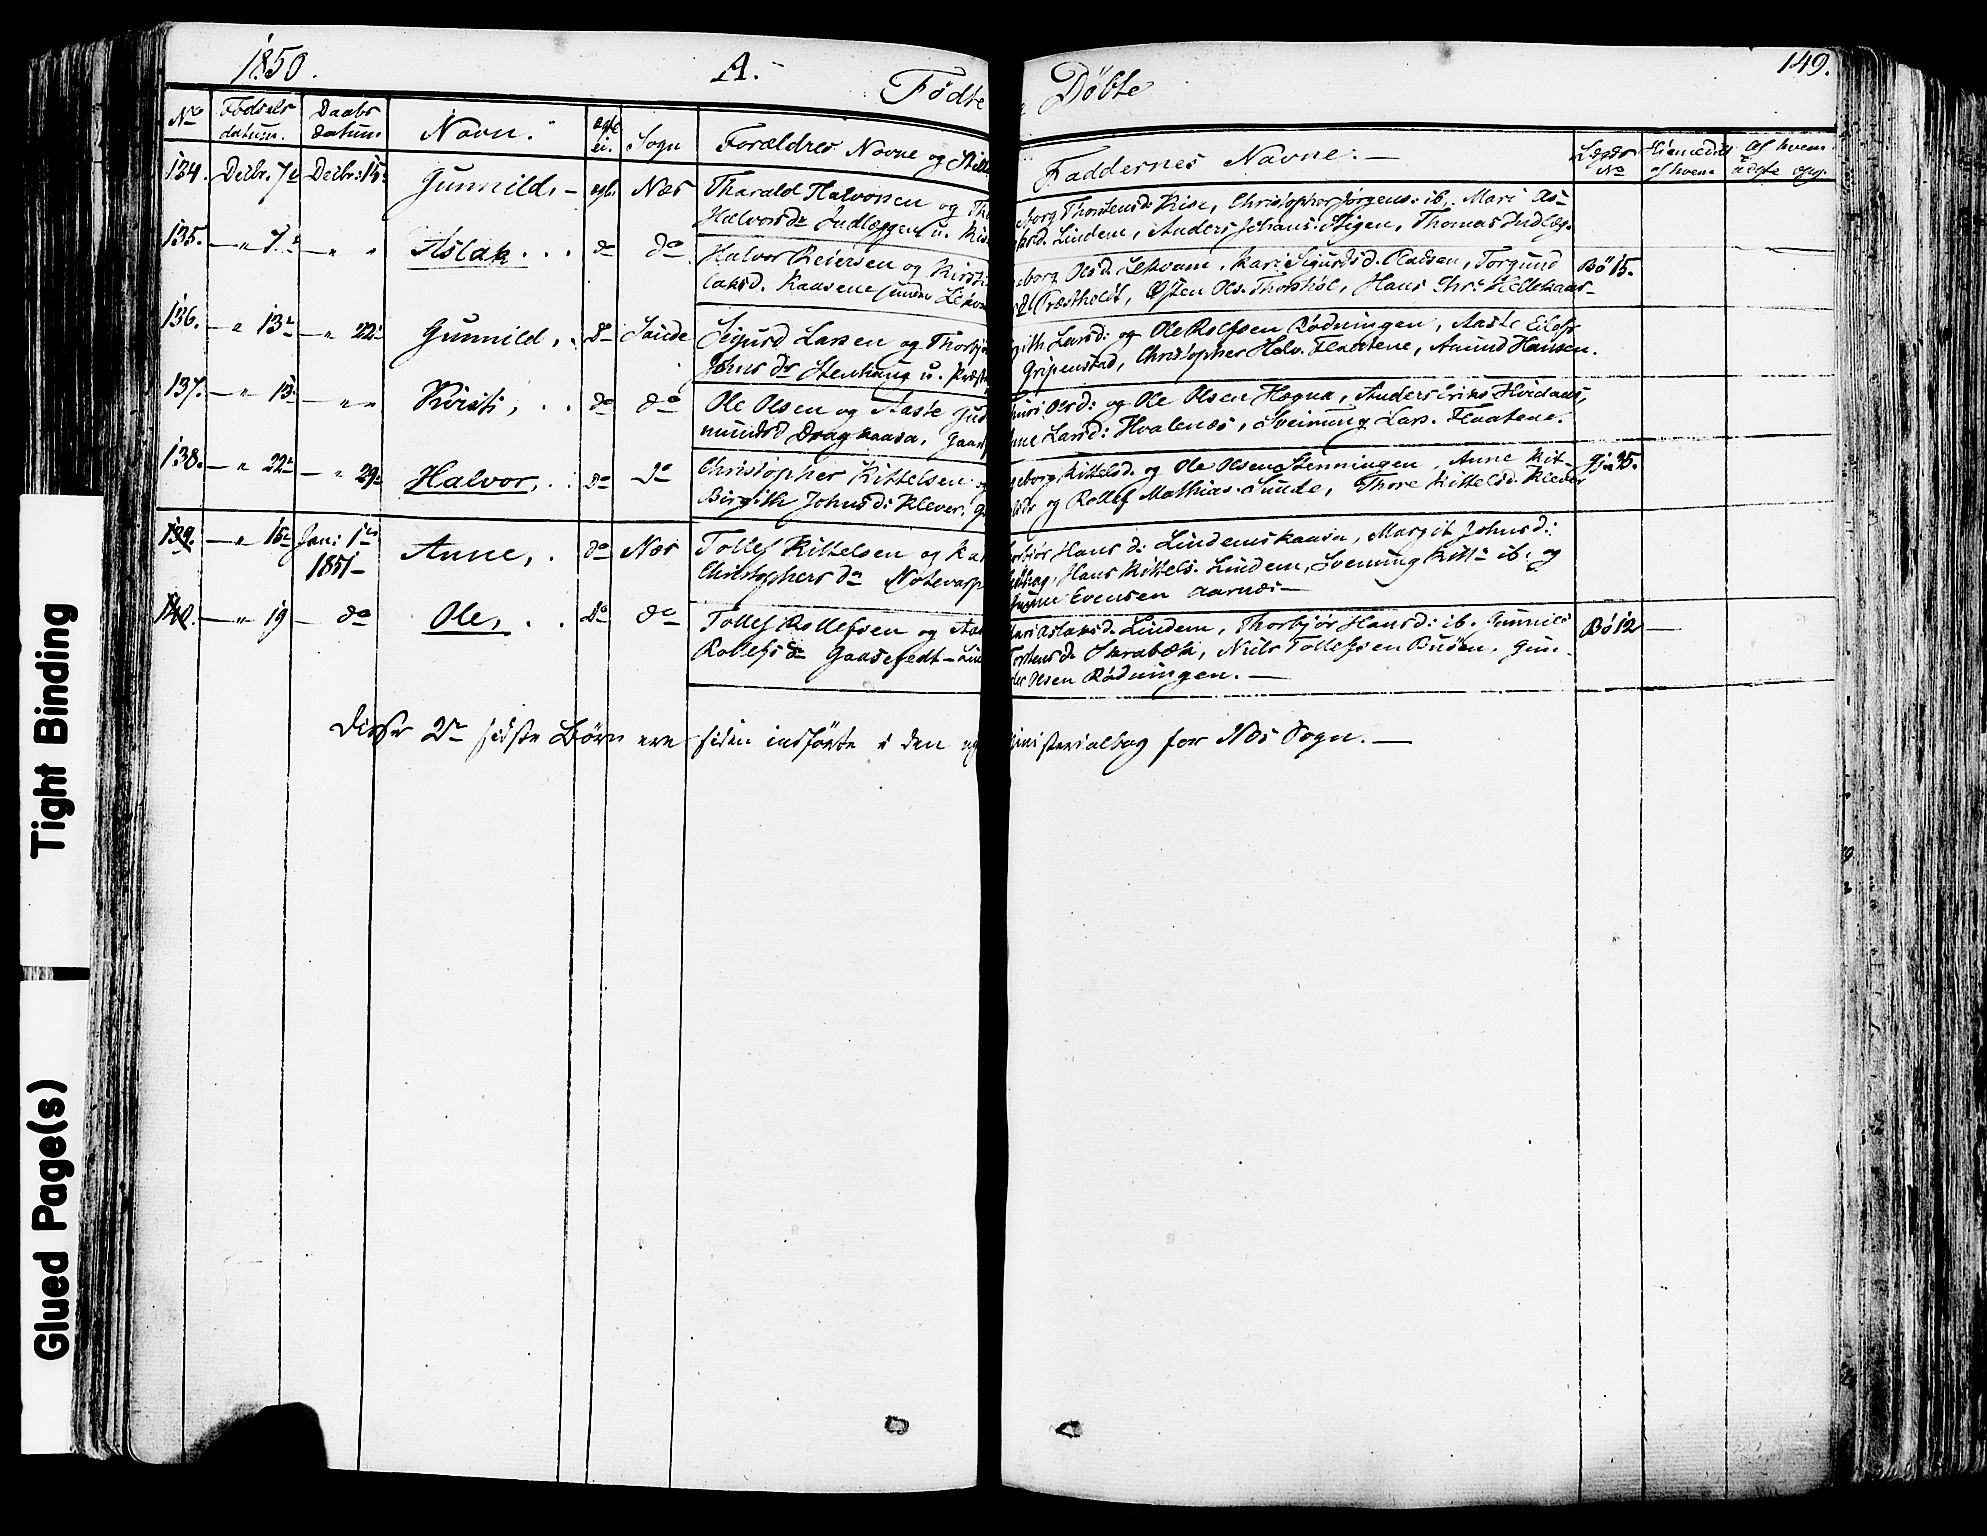 SAKO, Sauherad kirkebøker, F/Fa/L0006: Ministerialbok nr. I 6, 1827-1850, s. 149